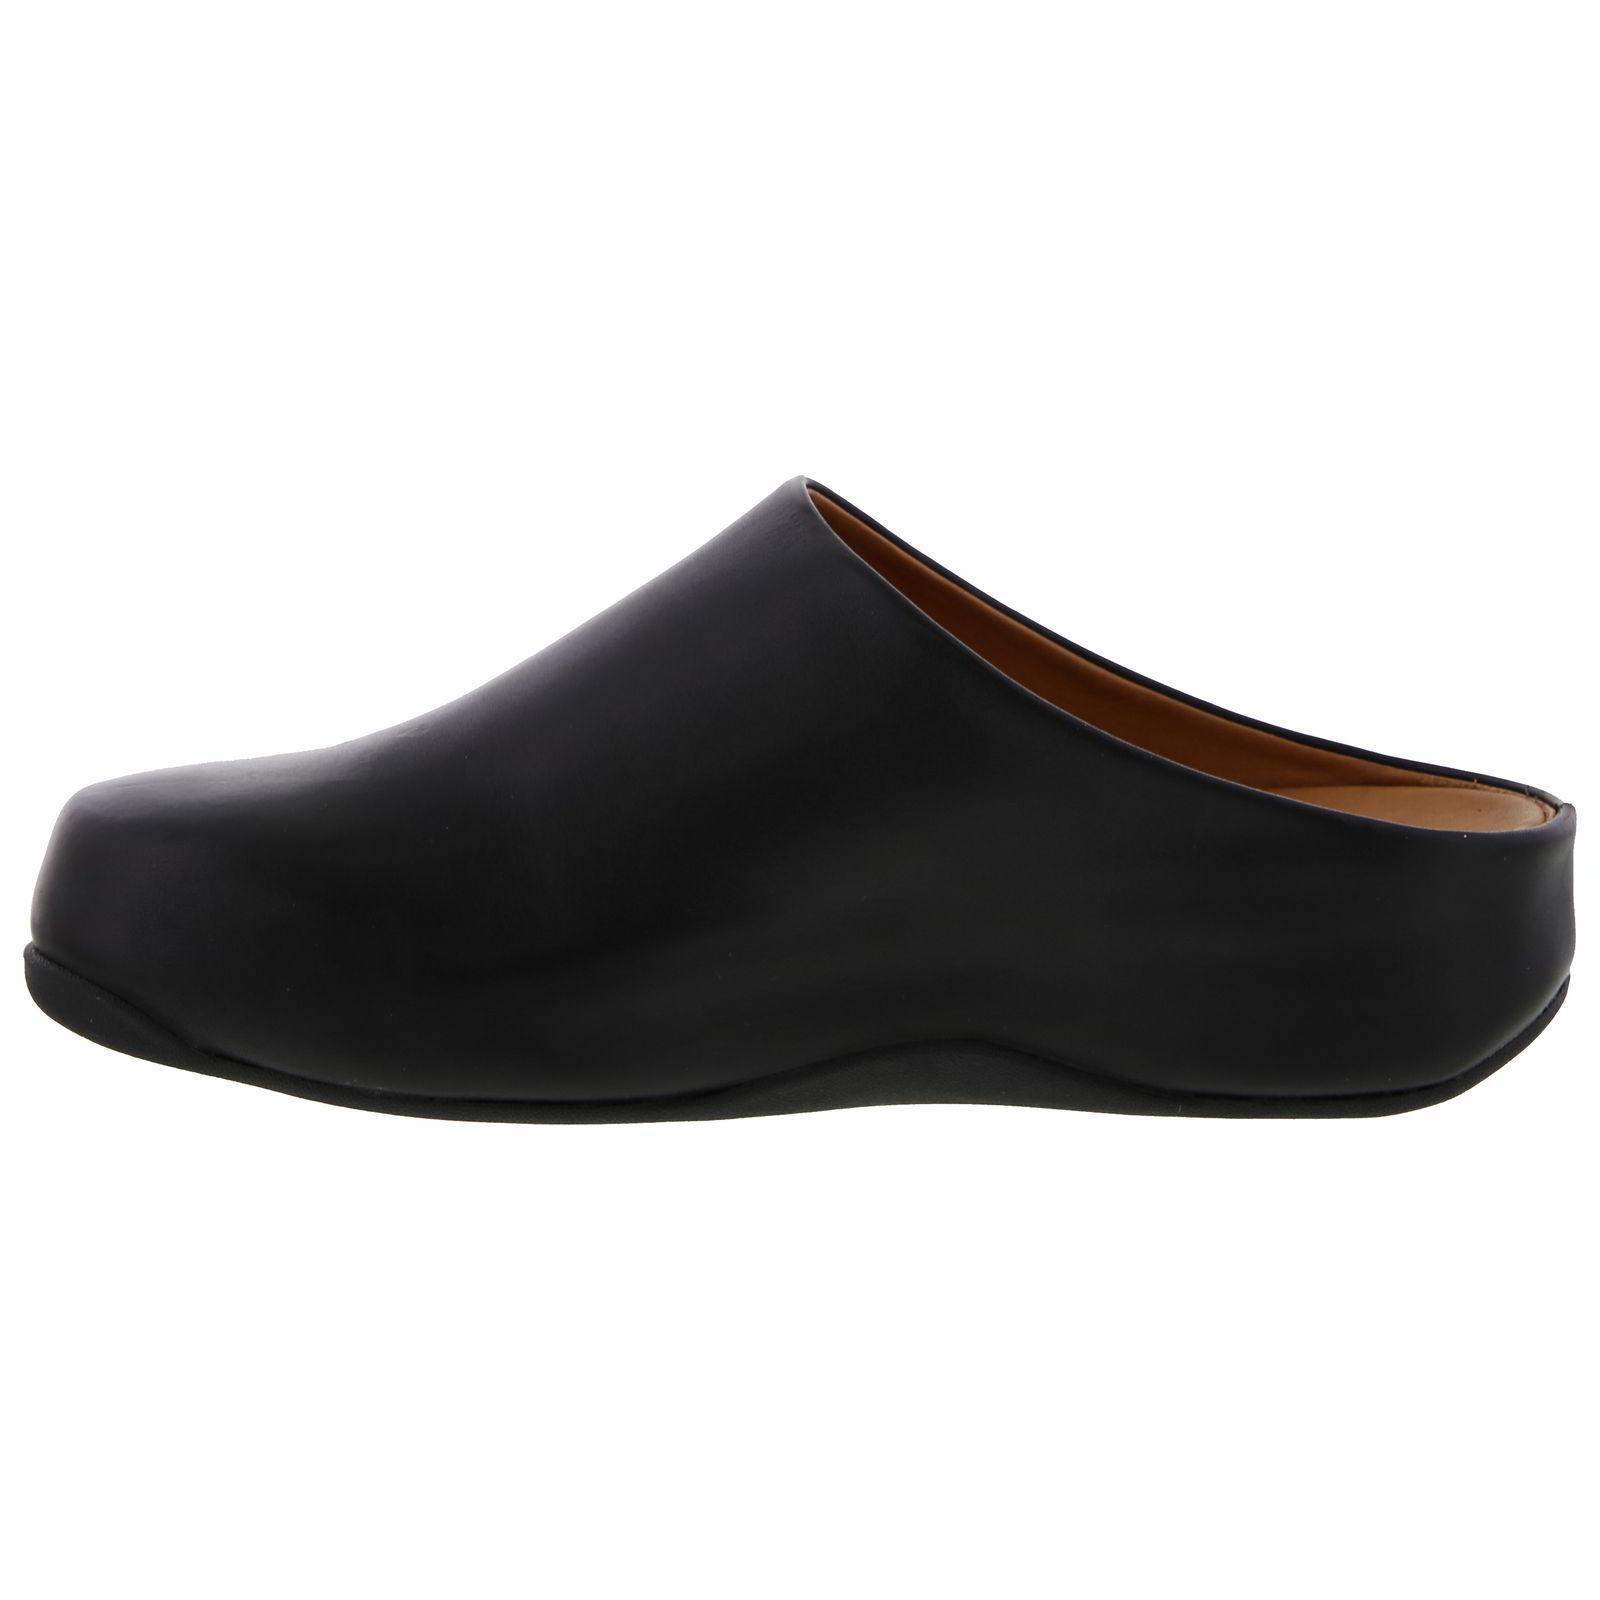 f0086d66cf6 Fitflop Shuv Leather Clog Slip On Shoes in Black for Men - Lyst